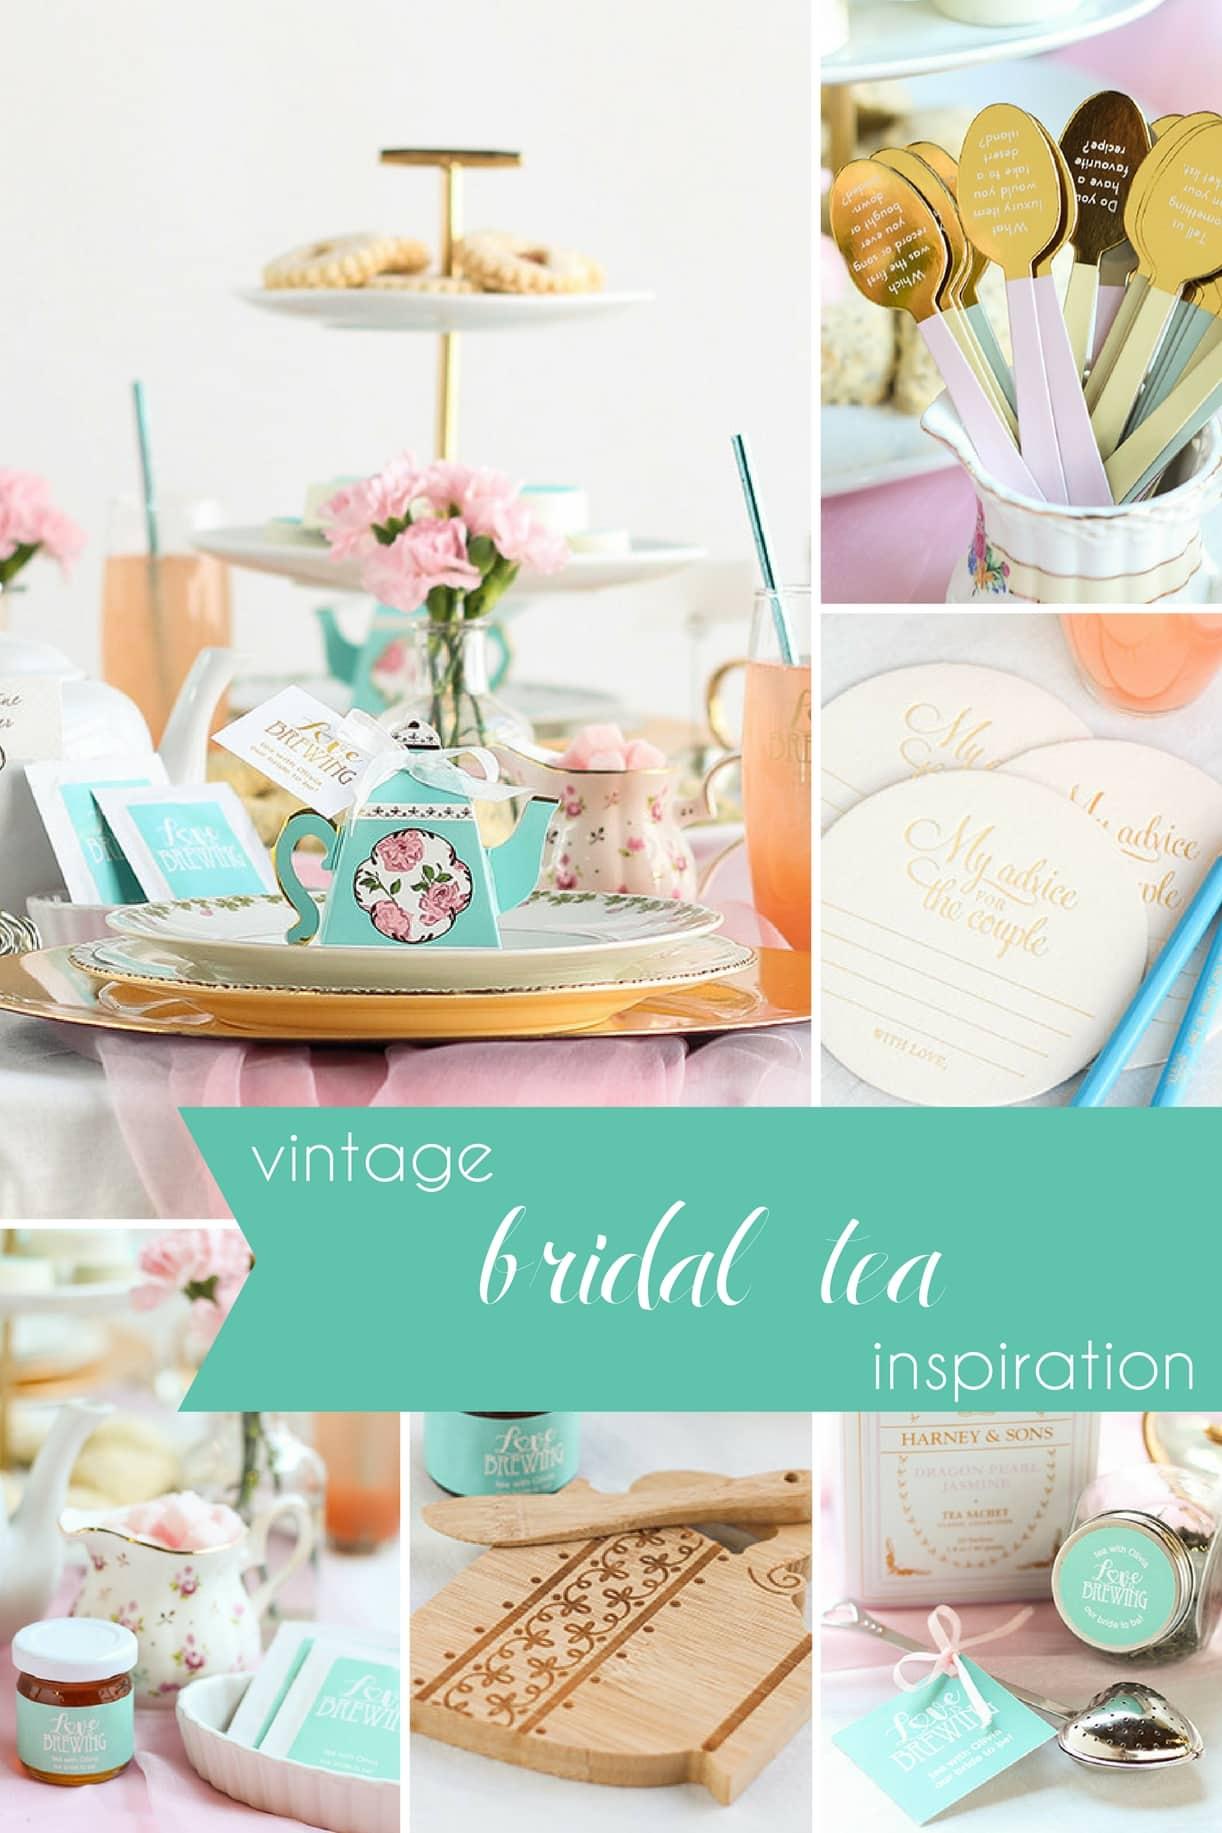 Vintage Bridal Tea Inspiration » Hill City Bride   Virginia Wedding Blog